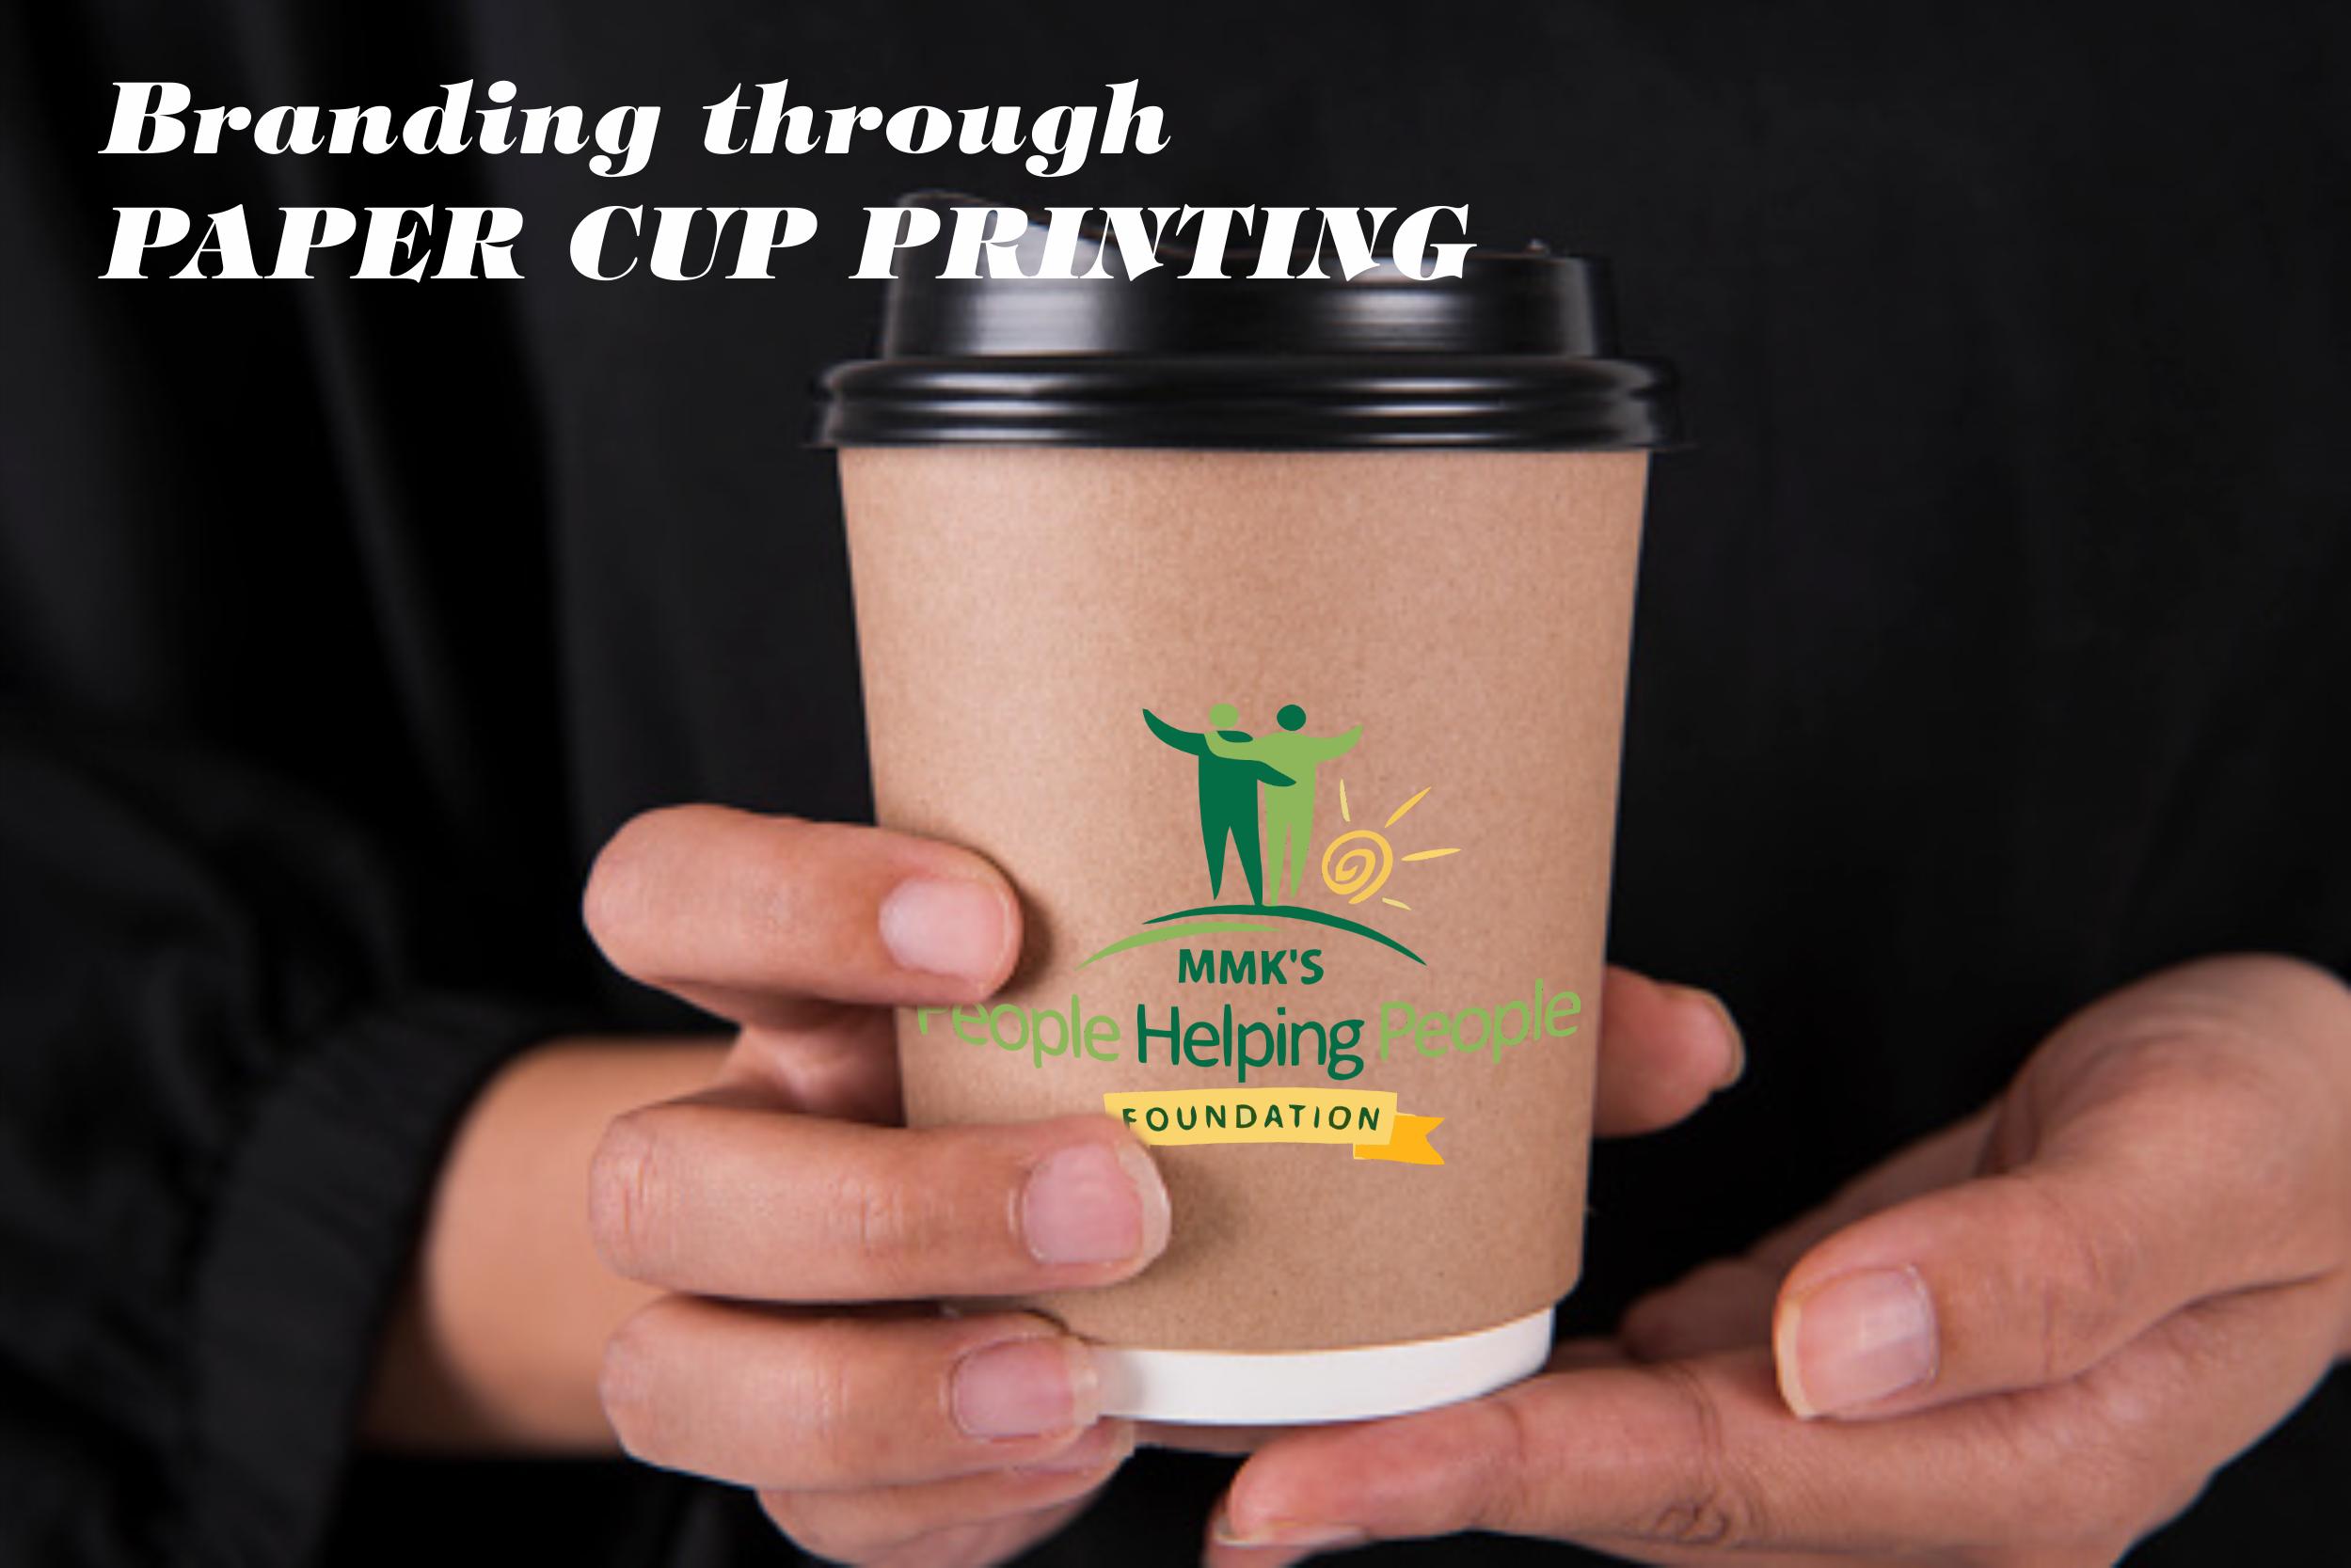 Branding through Paper Cup Printing